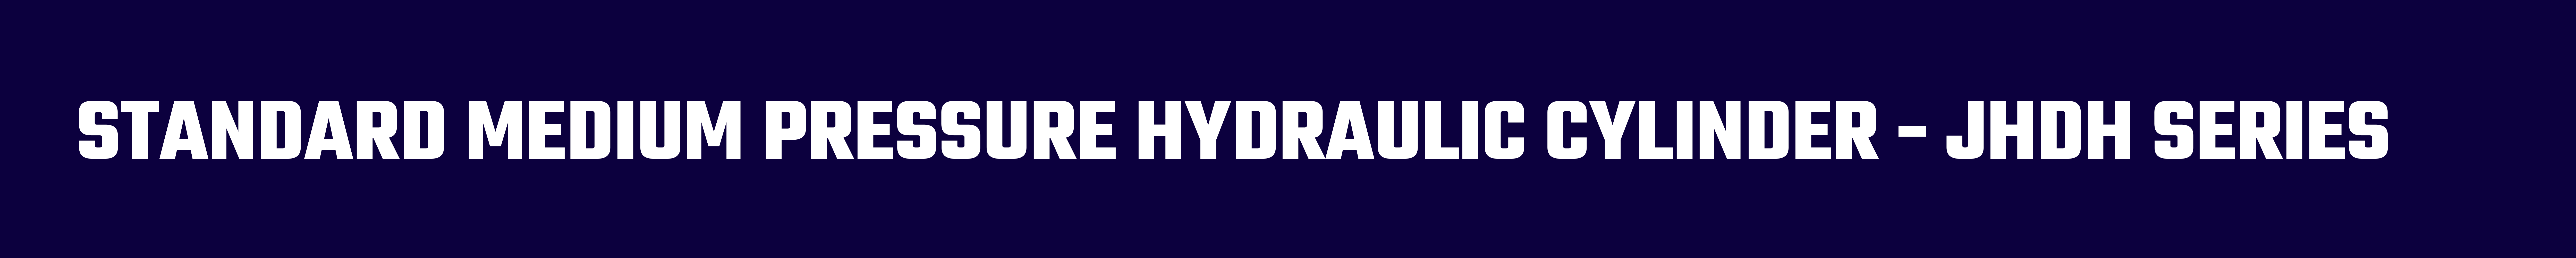 Standard Medium Pressure Hydraulic Cylinder JHDH Series